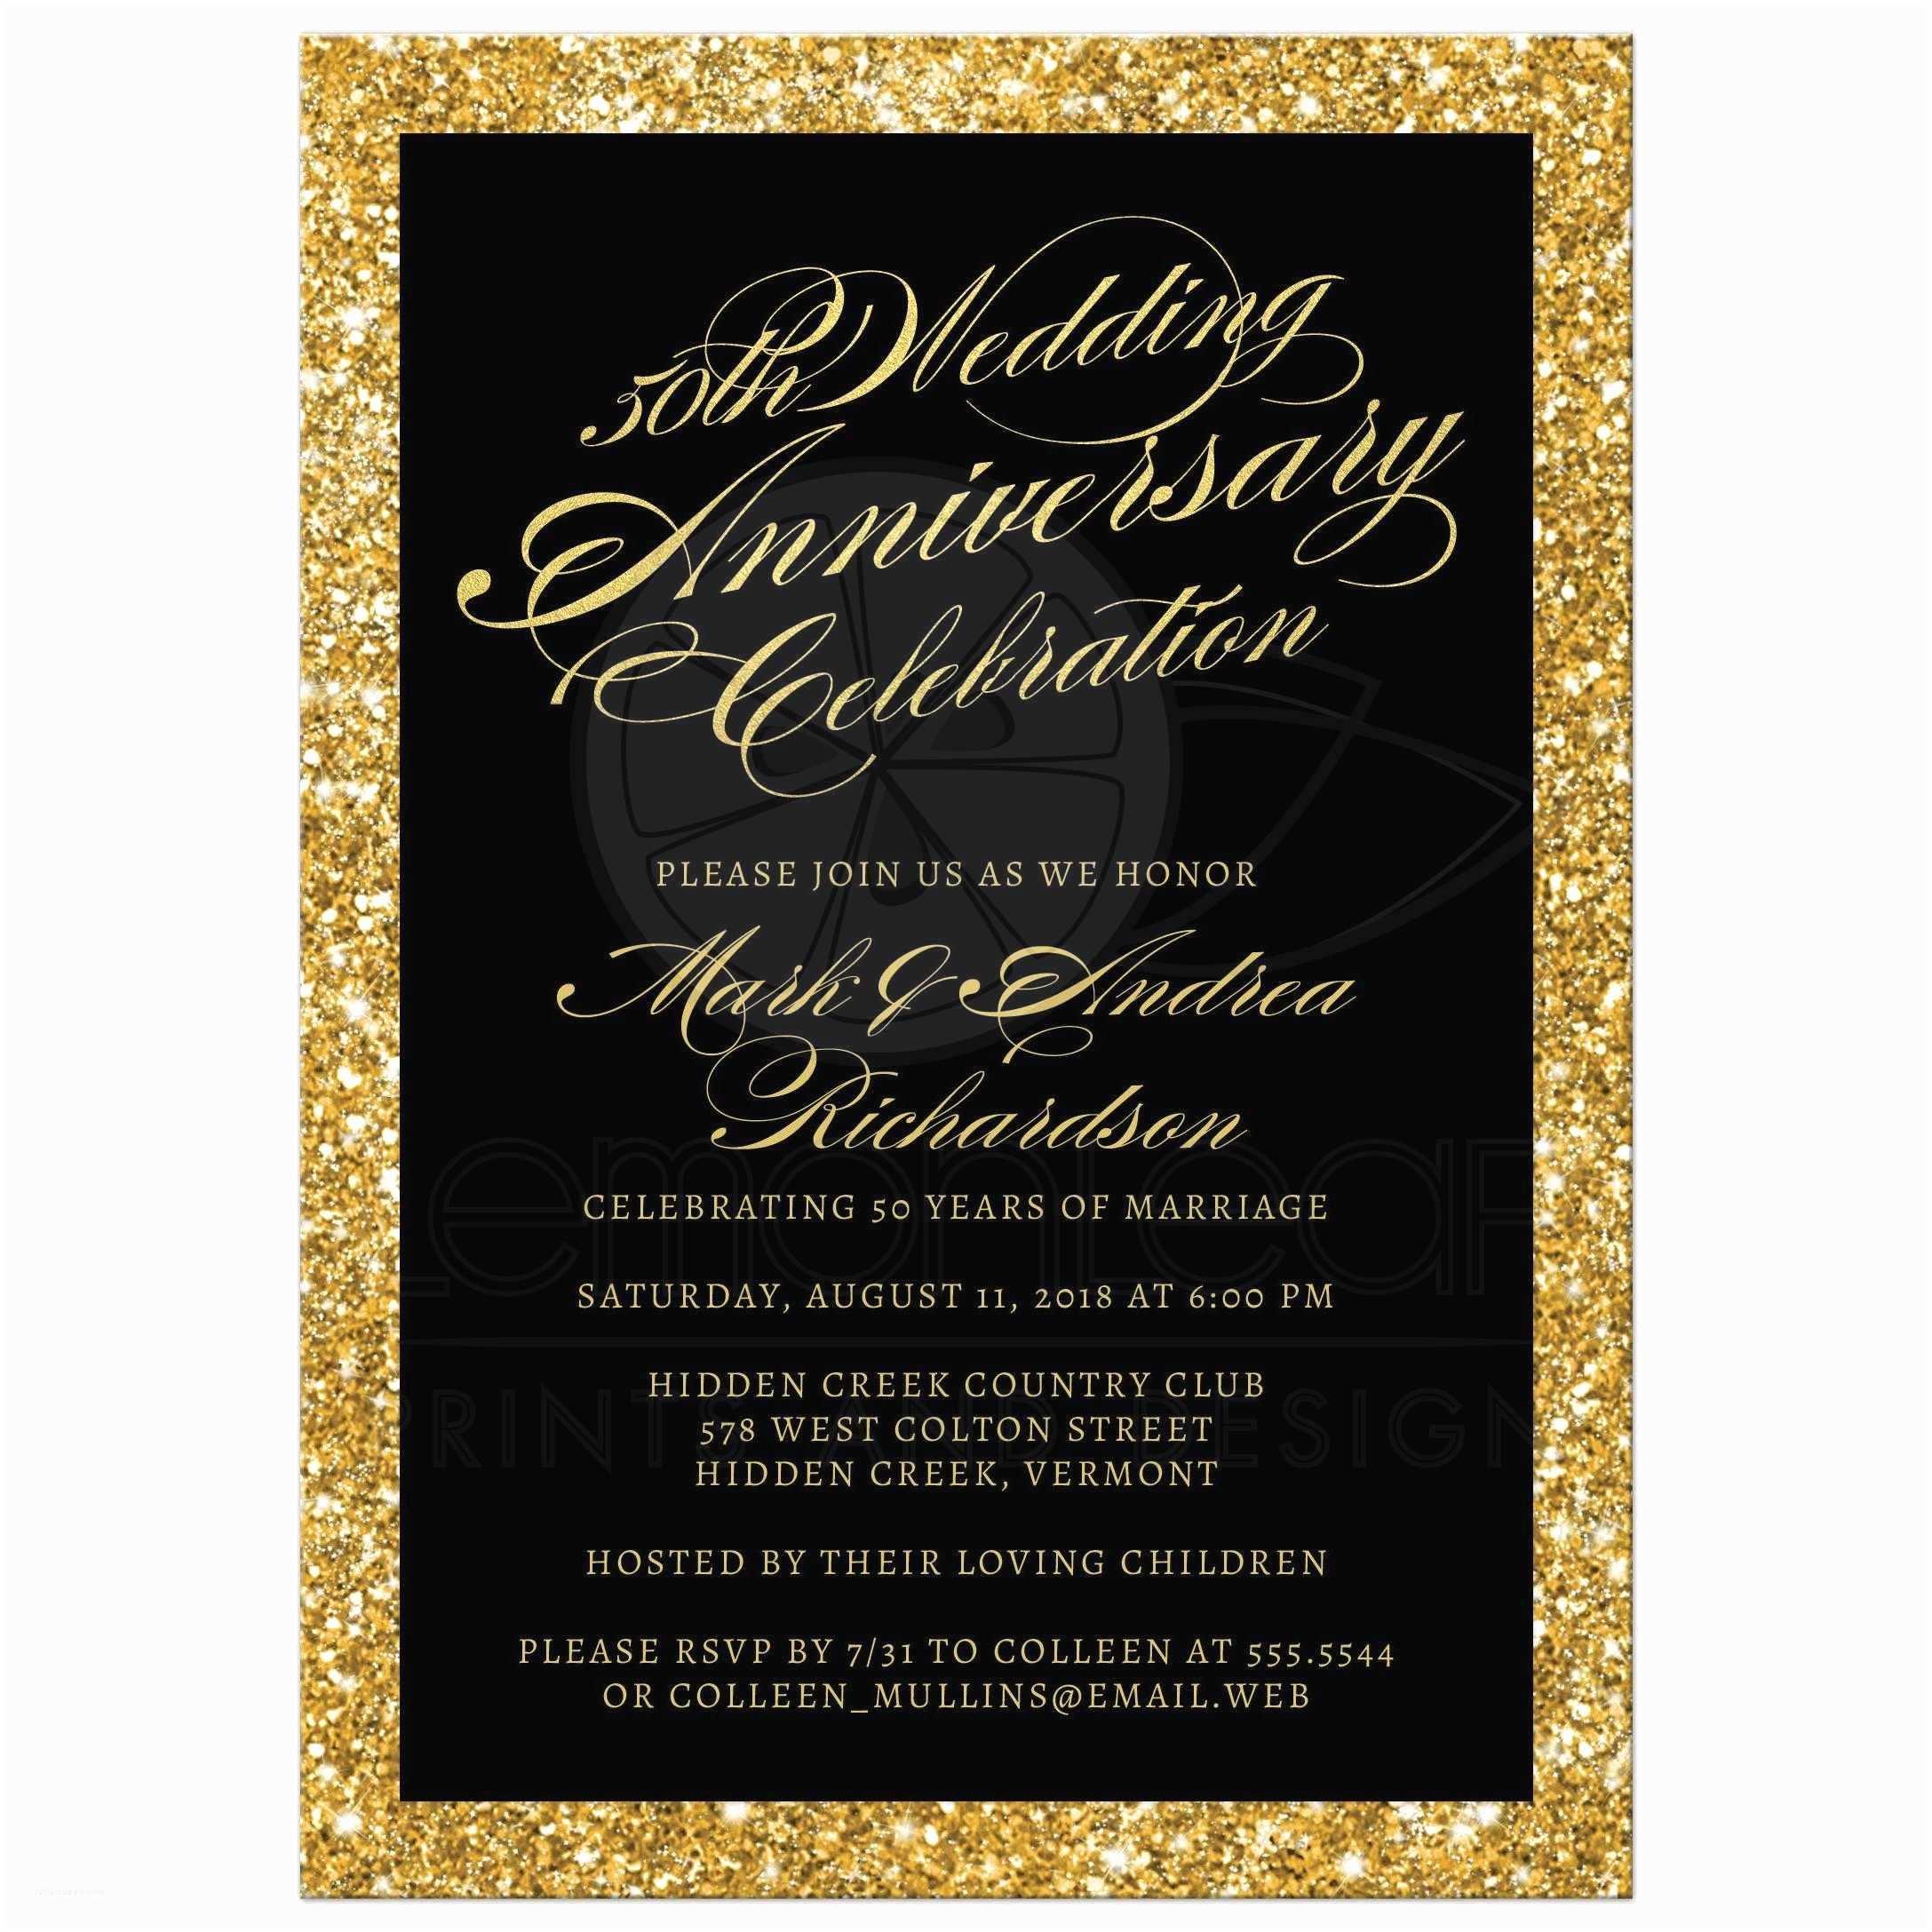 Gold Sparkle Wedding Invitations 50th Wedding Anniversary Party Invitations Gold Sparkle